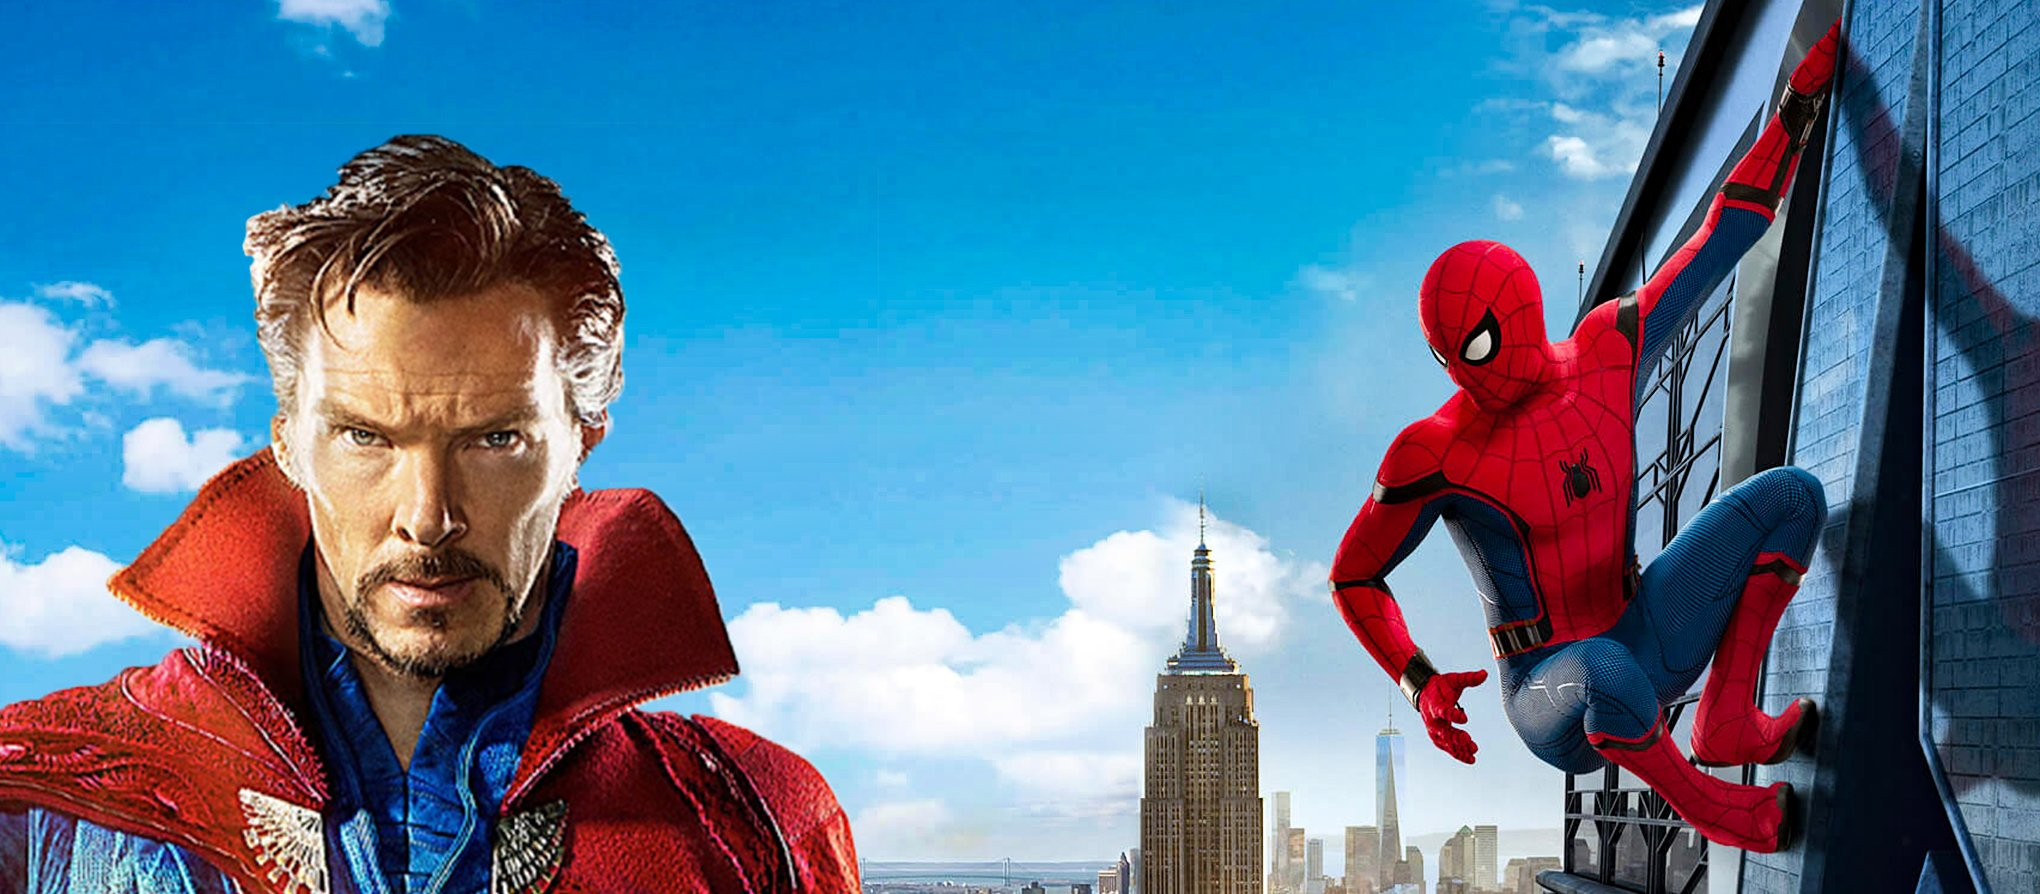 Doctor Strange in Spider-Man 3